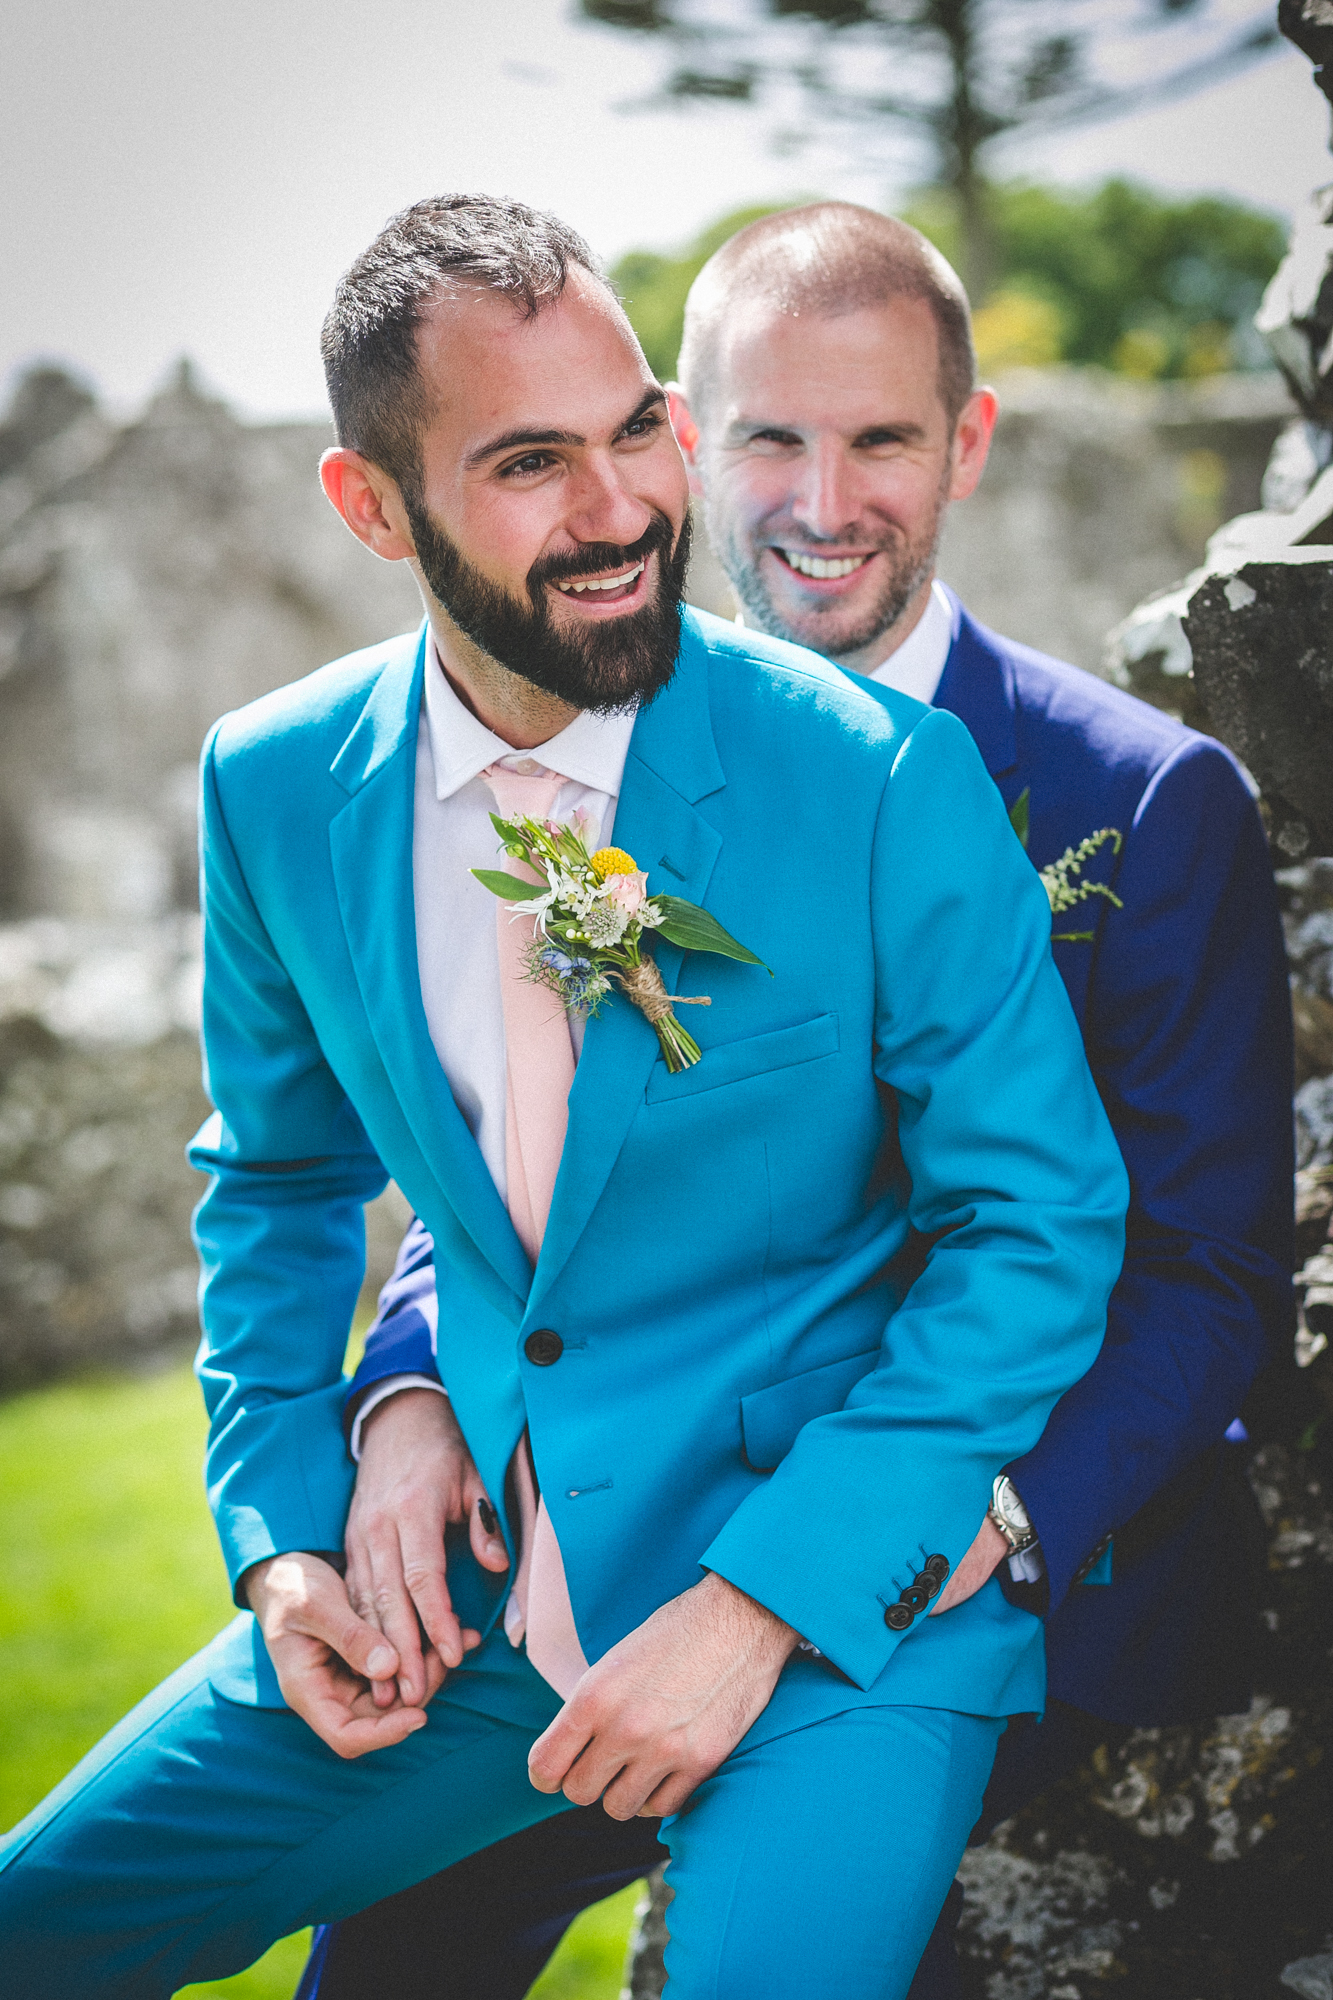 Gay weddings Ireland Millhouse-56.jpg